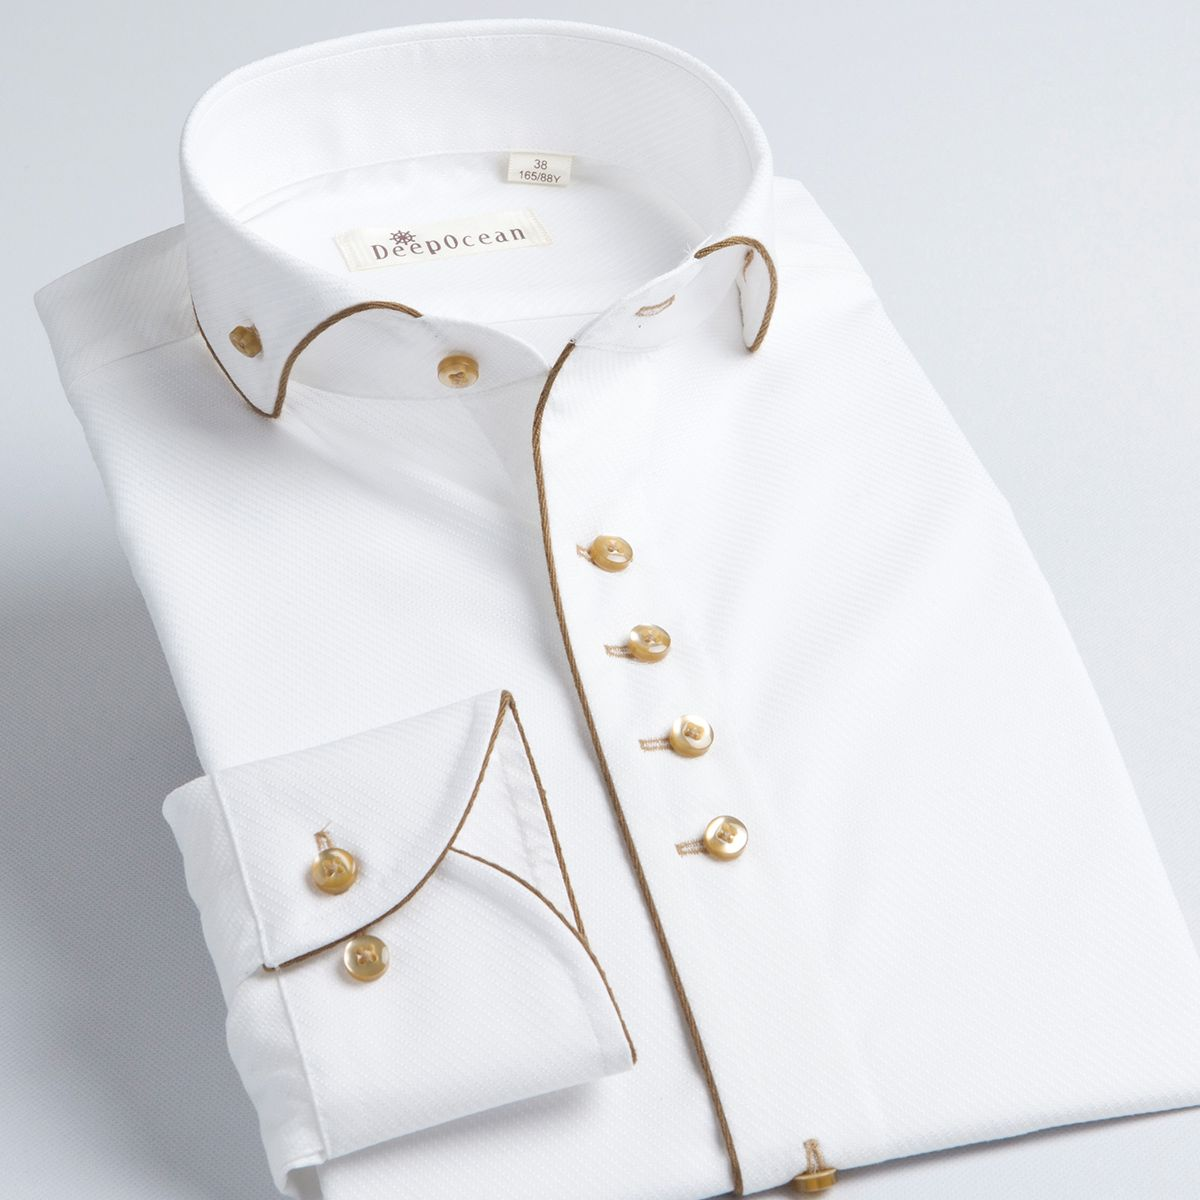 woman collars - Поиск в Google | Fashion | Pinterest | Deep sea ...